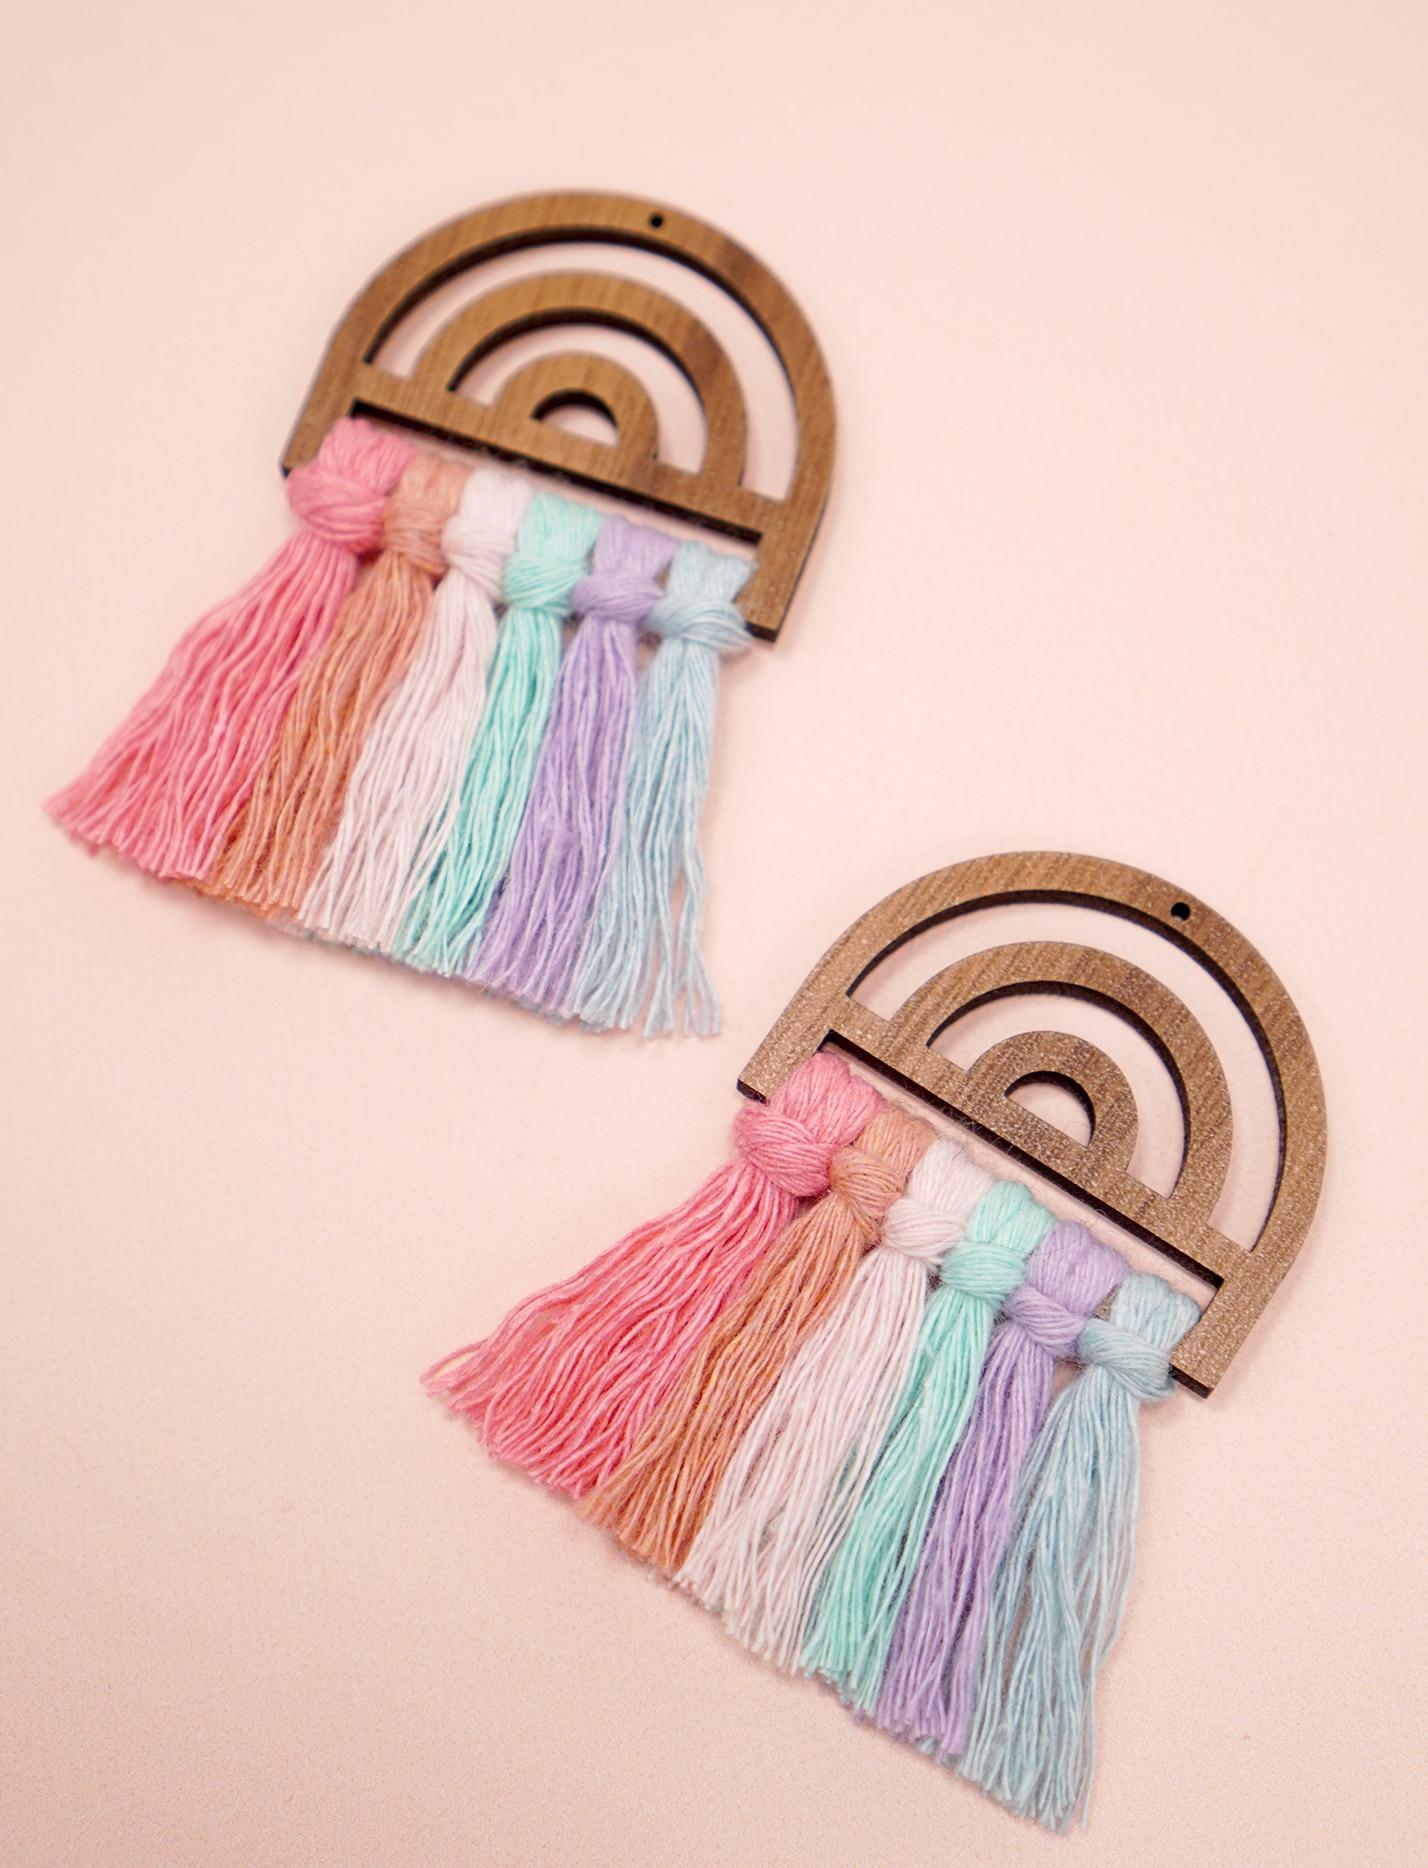 pastel wooden rainbow macrame earrings on peach background